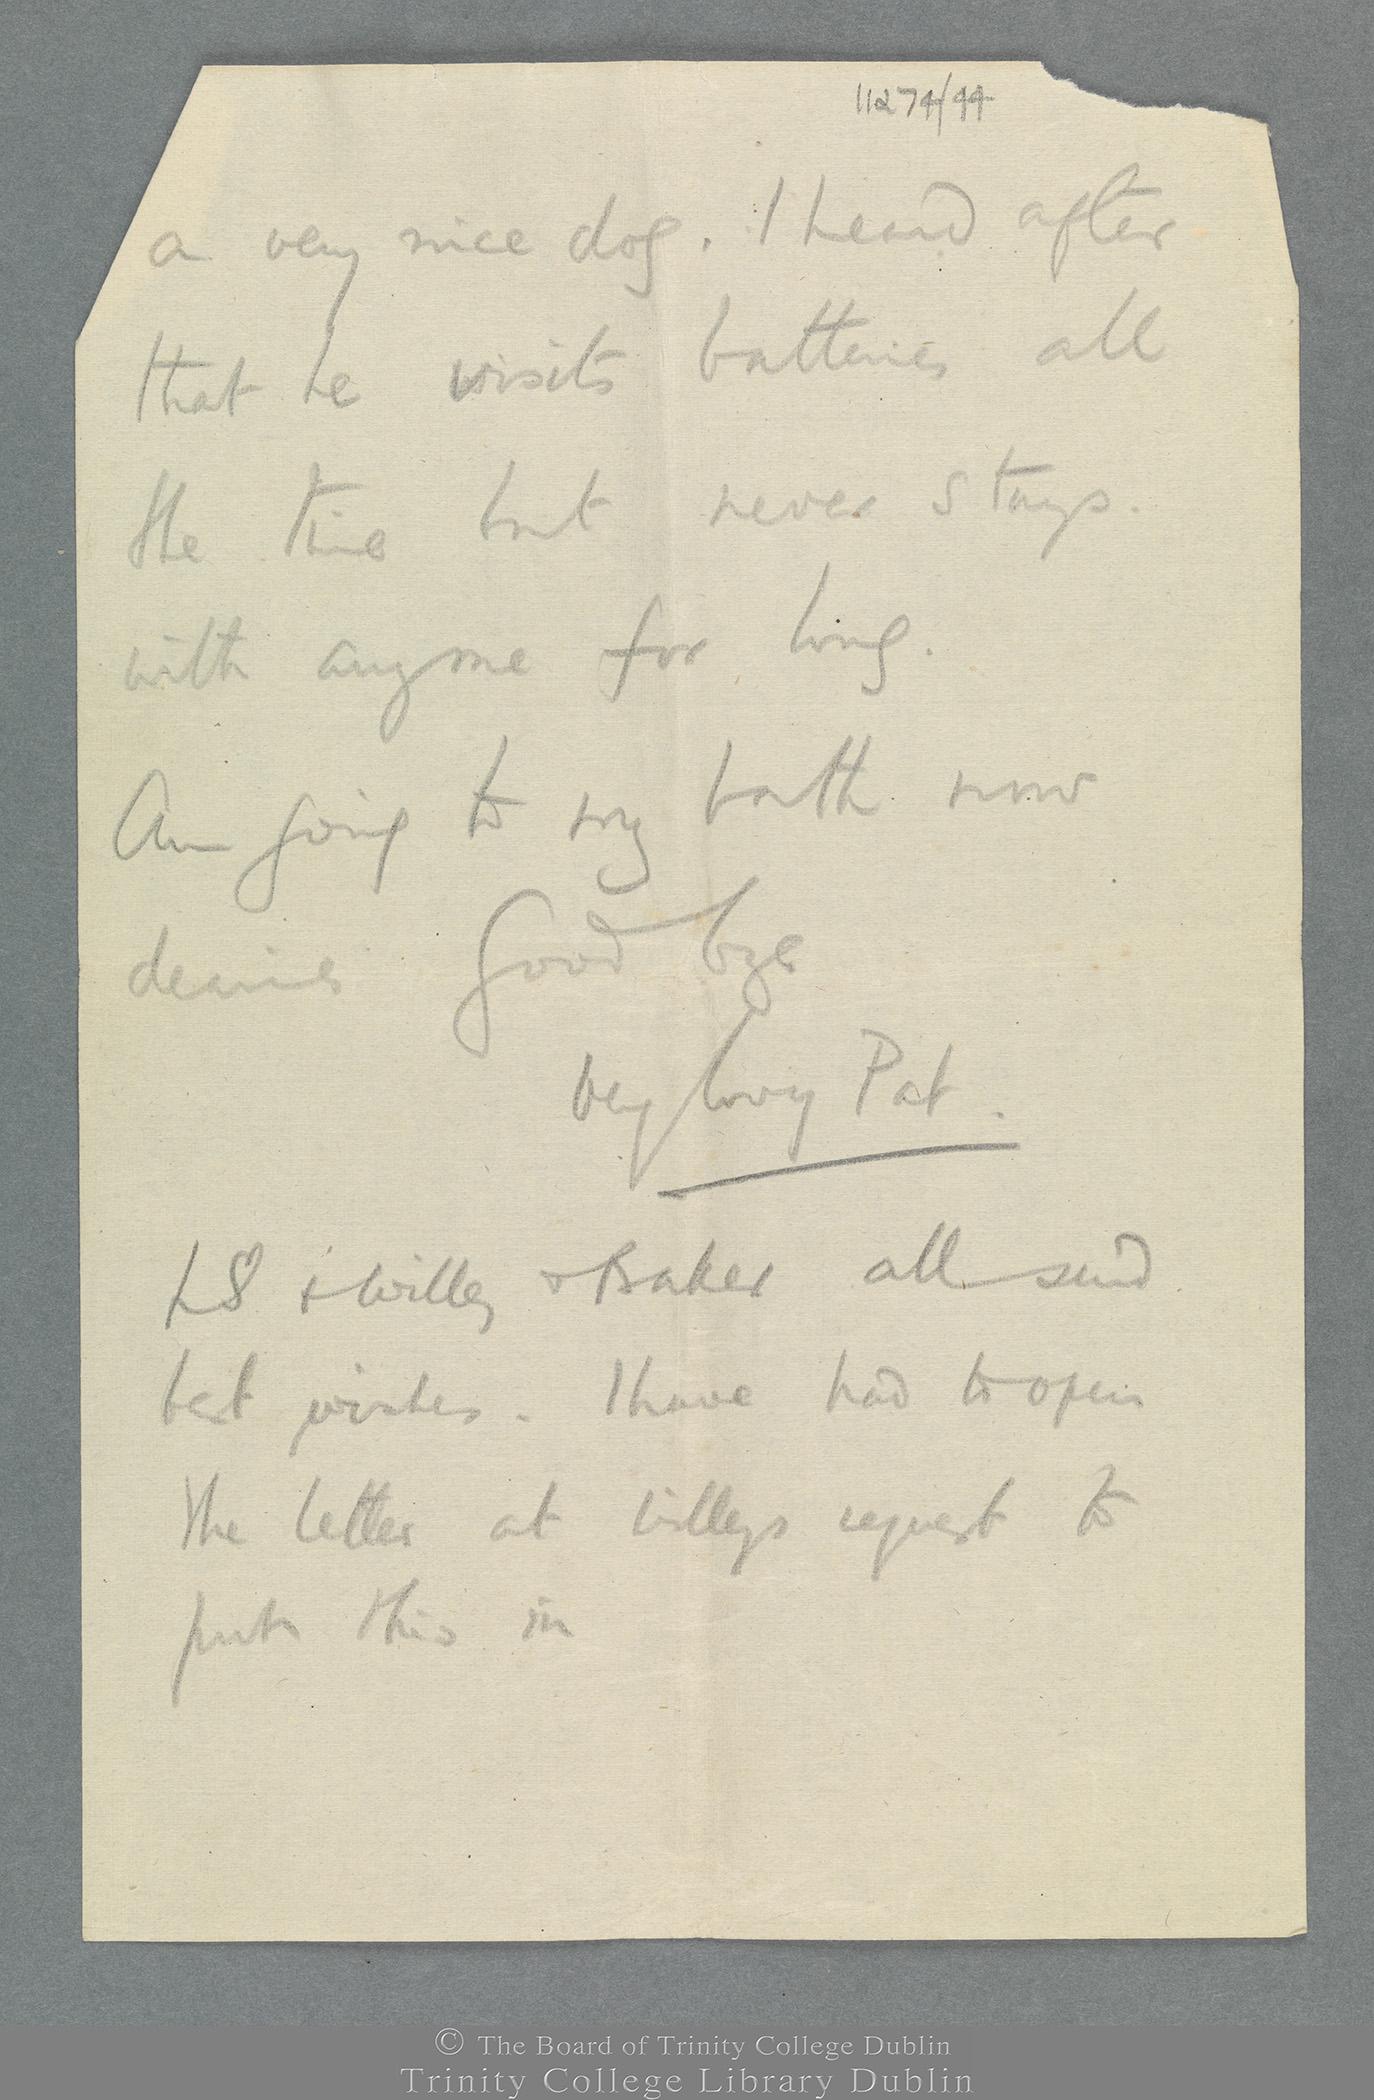 TCD MS 11274/44 folio 4 recto